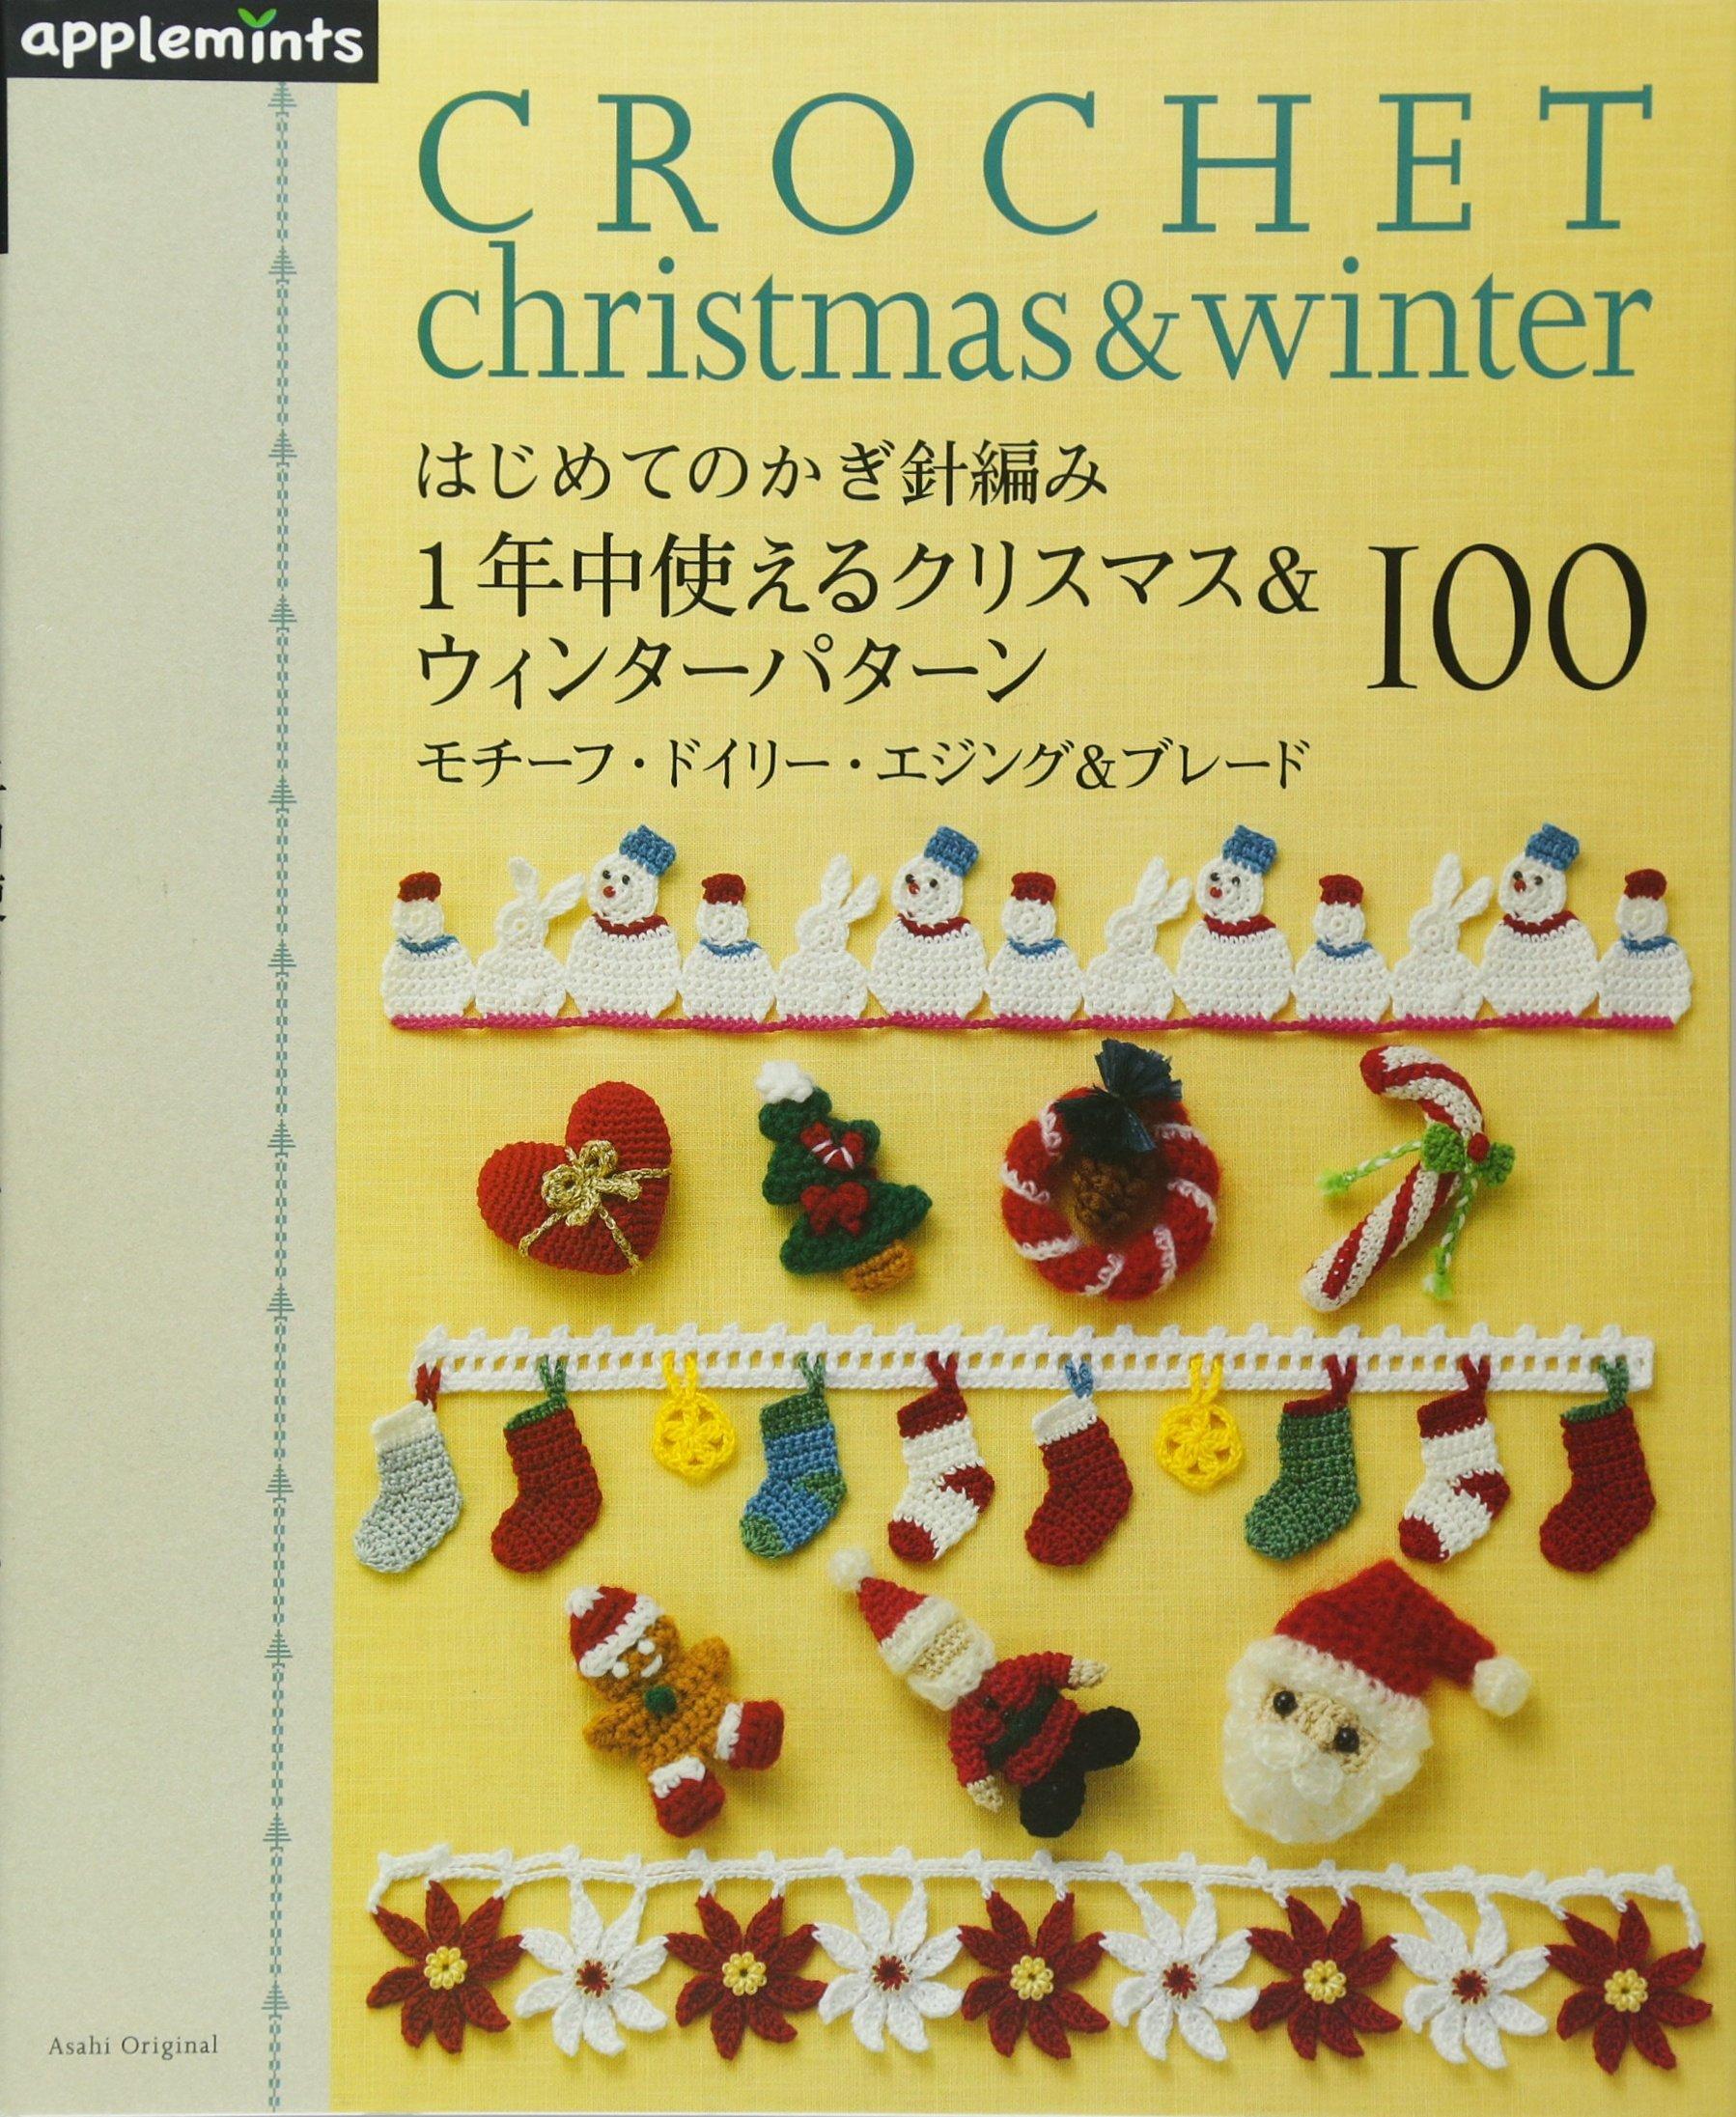 Christmas & Winter croshet pattern 100 motif